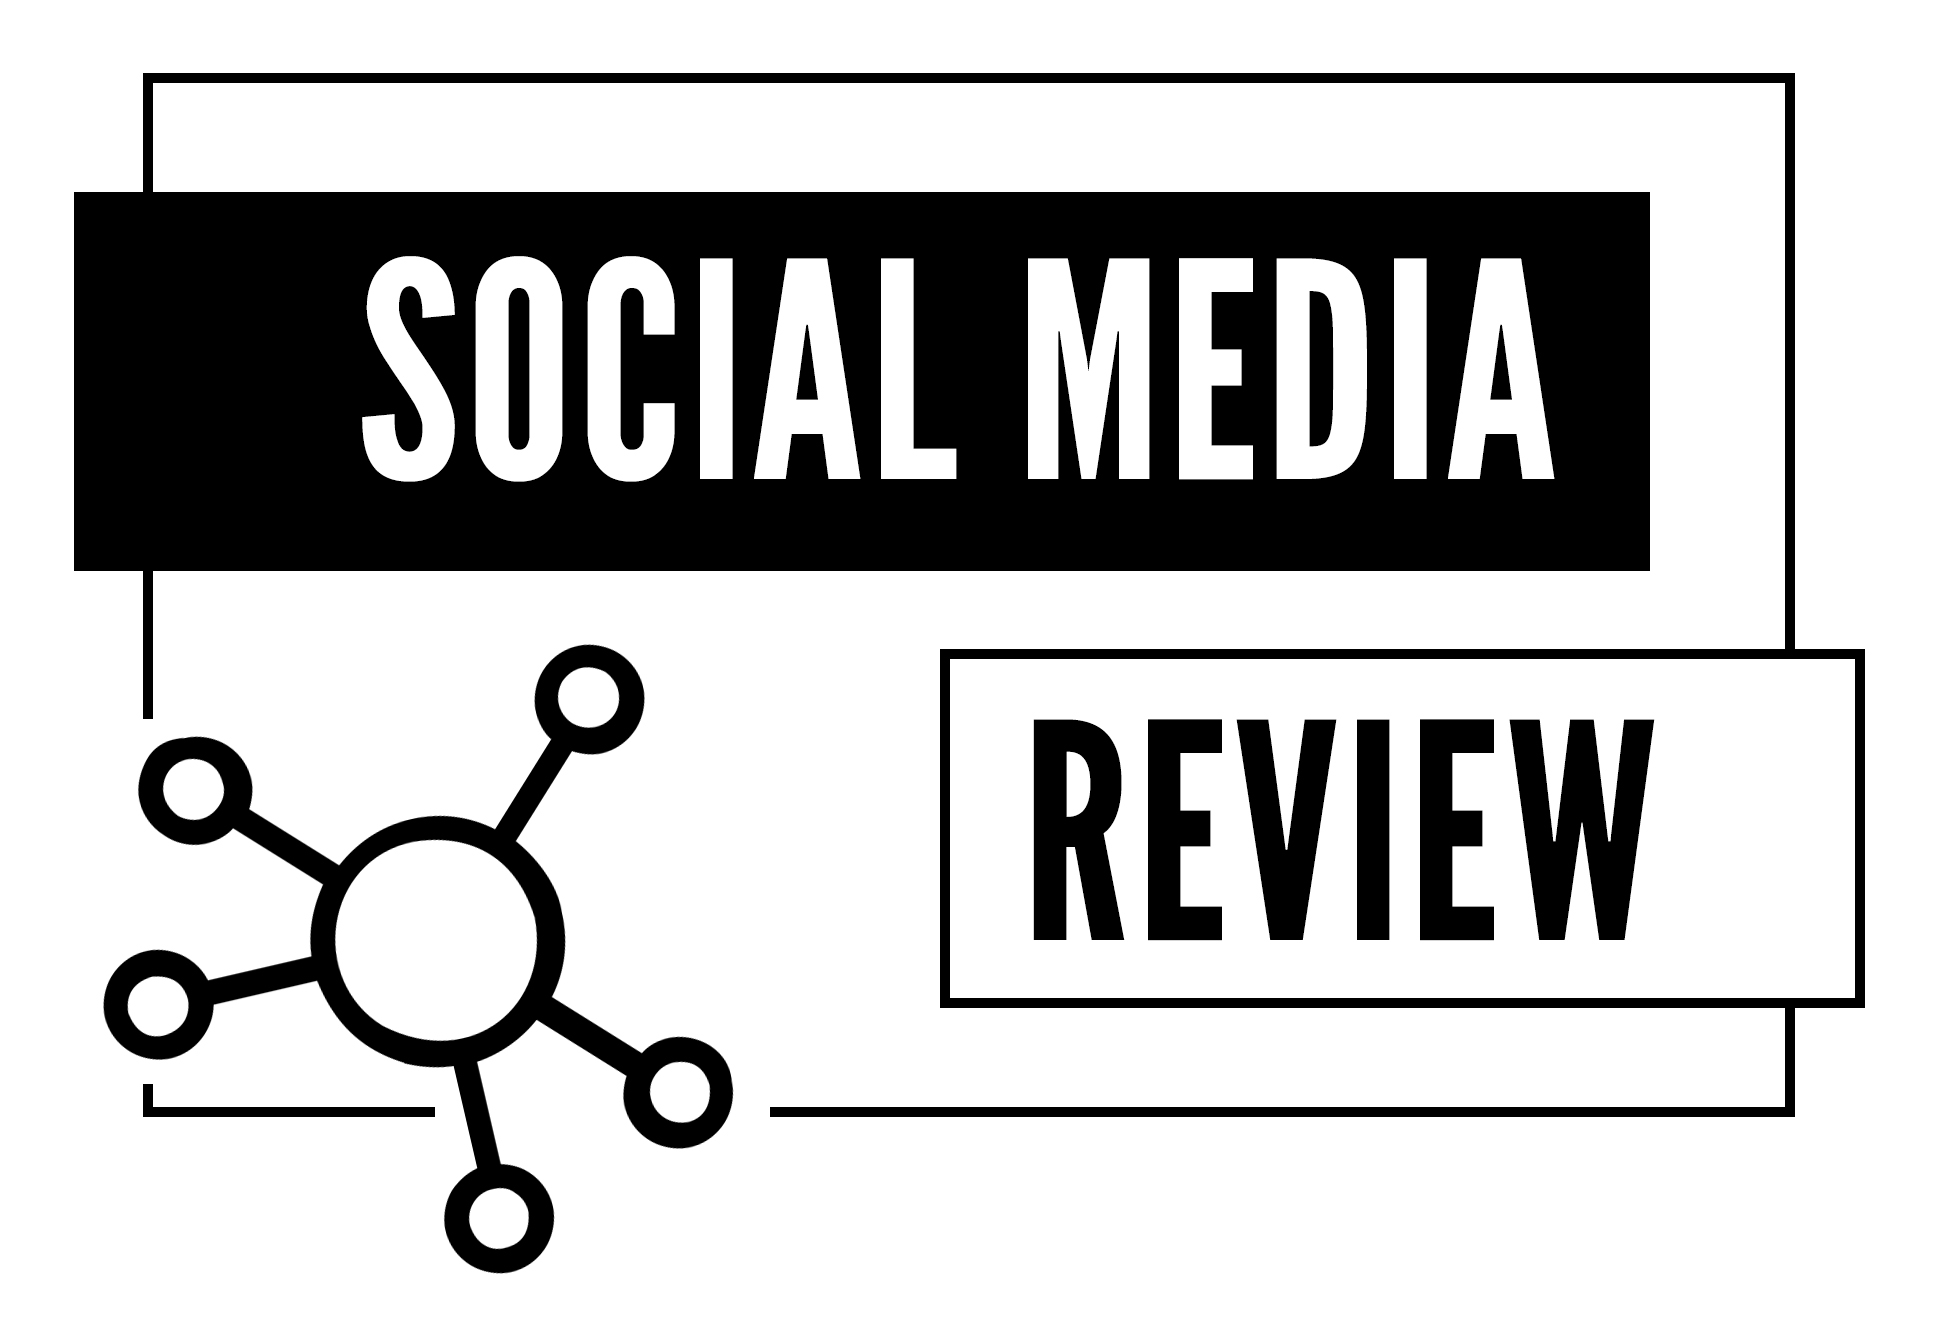 Social Media Review.jpg